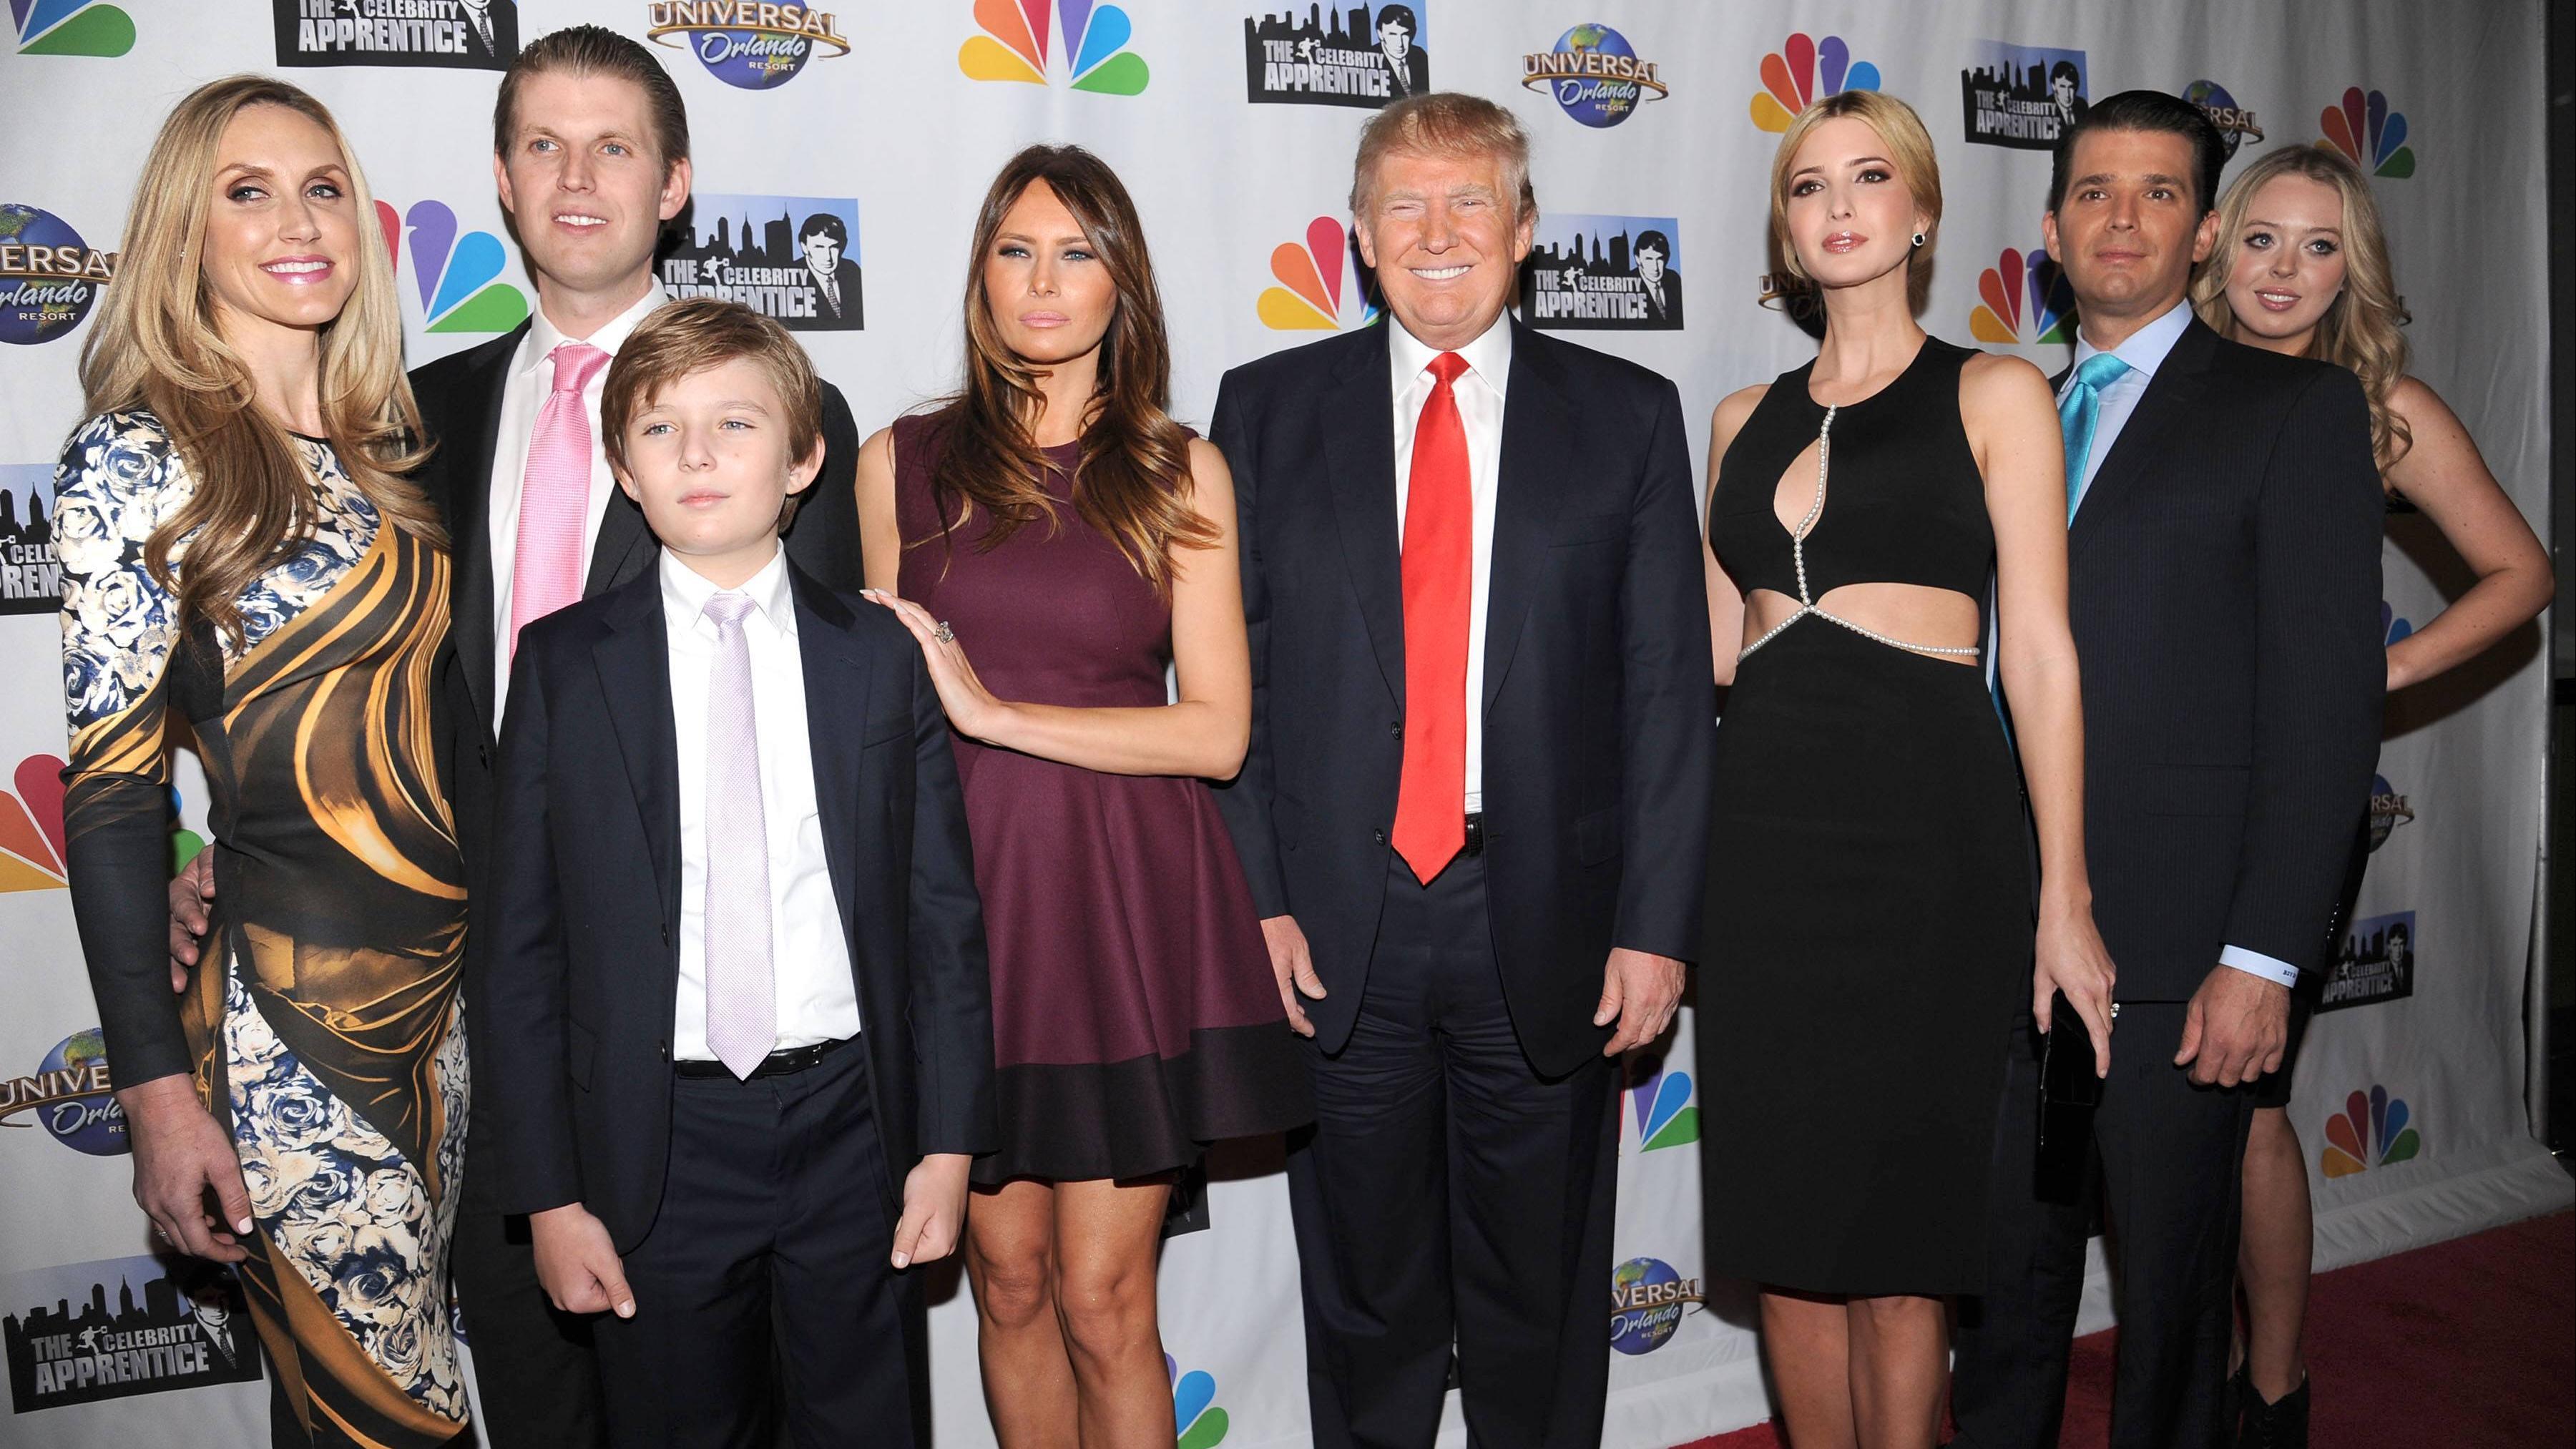 Schrecklich nette Familie (v.l.): Lara Trump, Eric Trump, Barron Trump, Melania Trump, Donald Trump, Ivanka Trump, Donald Trump Jr undTiffany Trump 2015 in New York